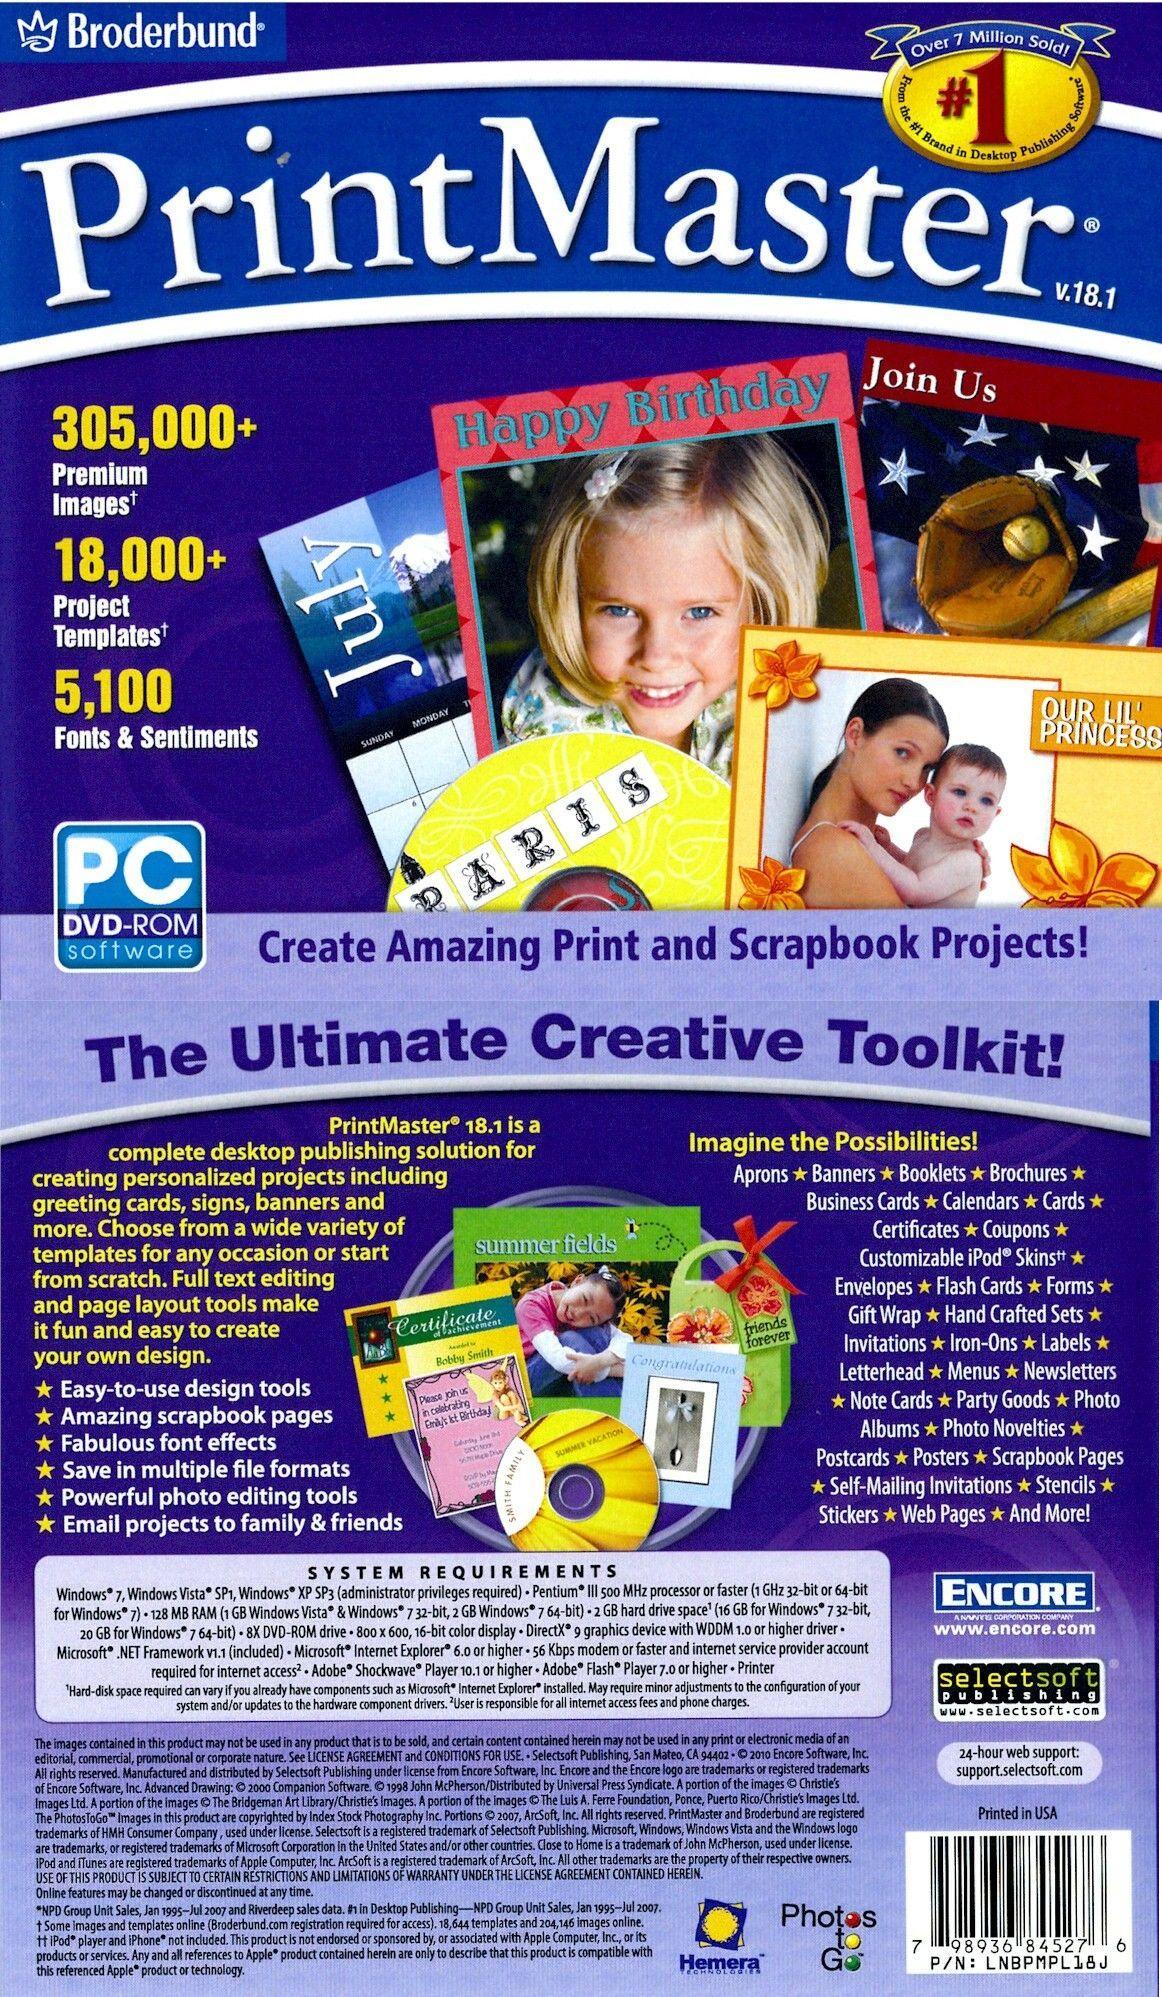 Printshop 23.1 Deluxe 23 Print Shop PC Windows XP Vista Win 7 8 10 New Sealed